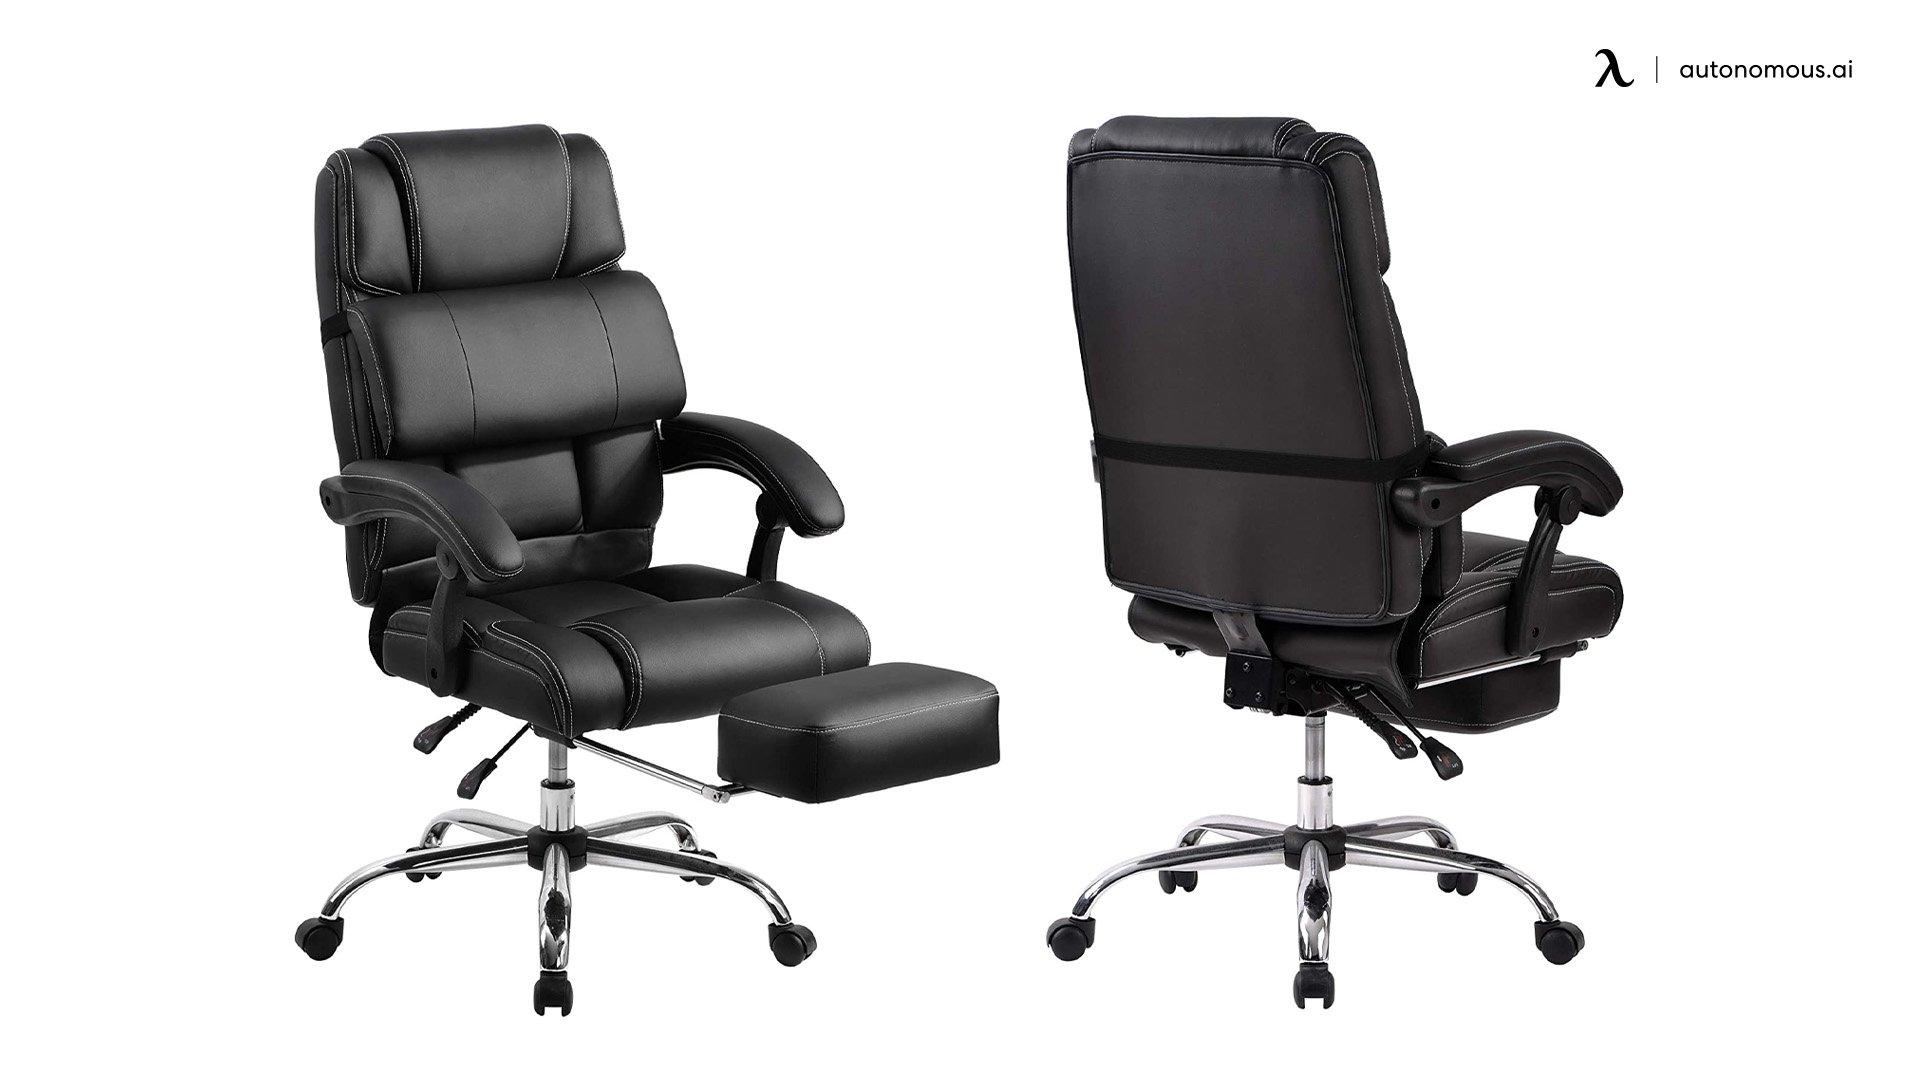 Julyfox Reclining Office Chair